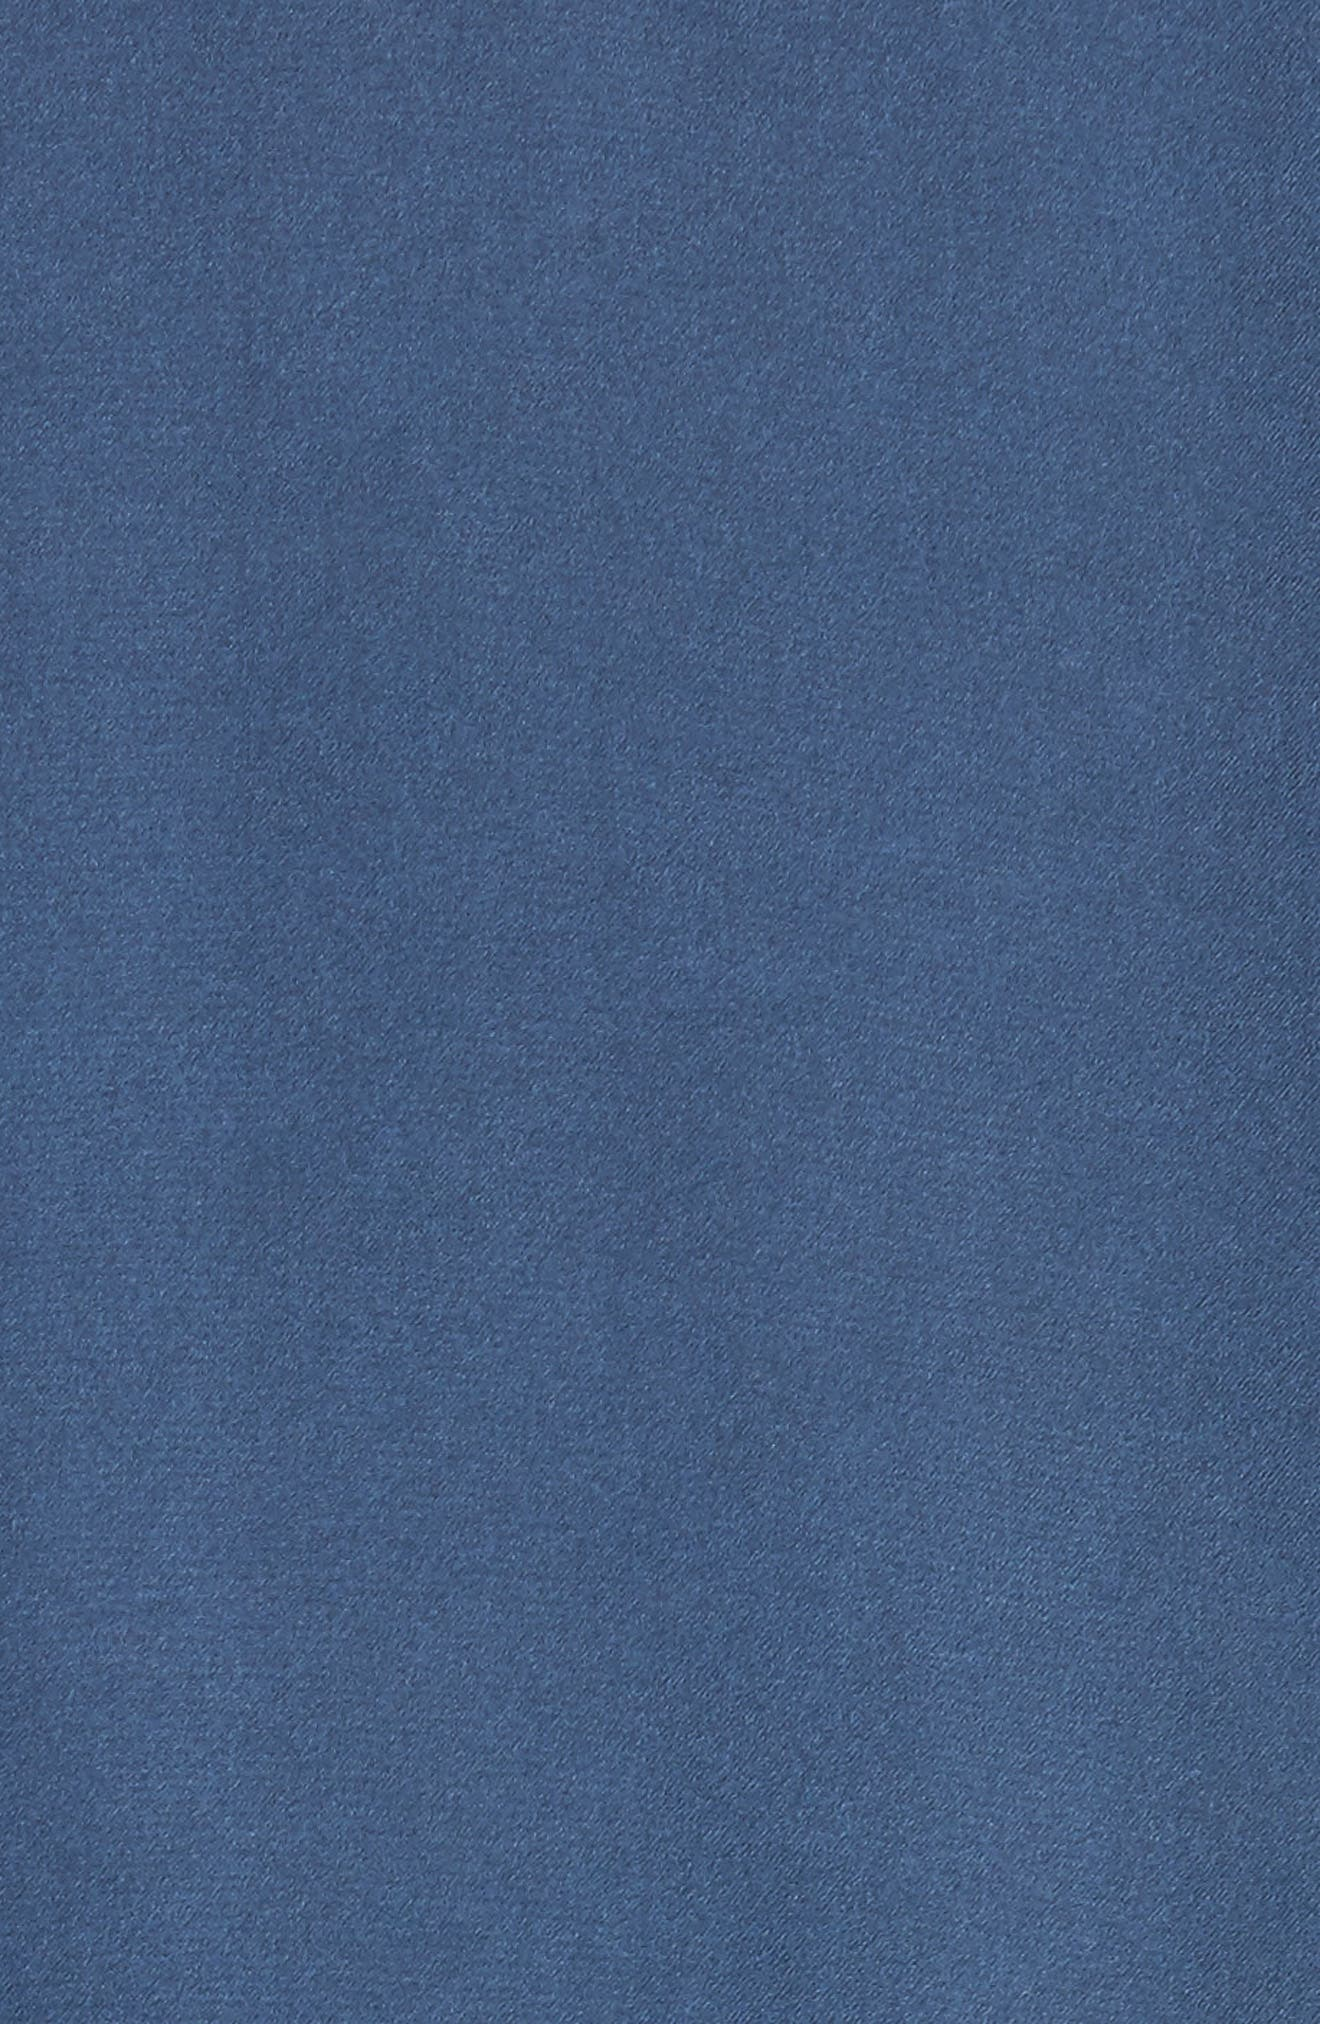 Satin Souvenir Bomber Jacket,                             Alternate thumbnail 5, color,                             Blue